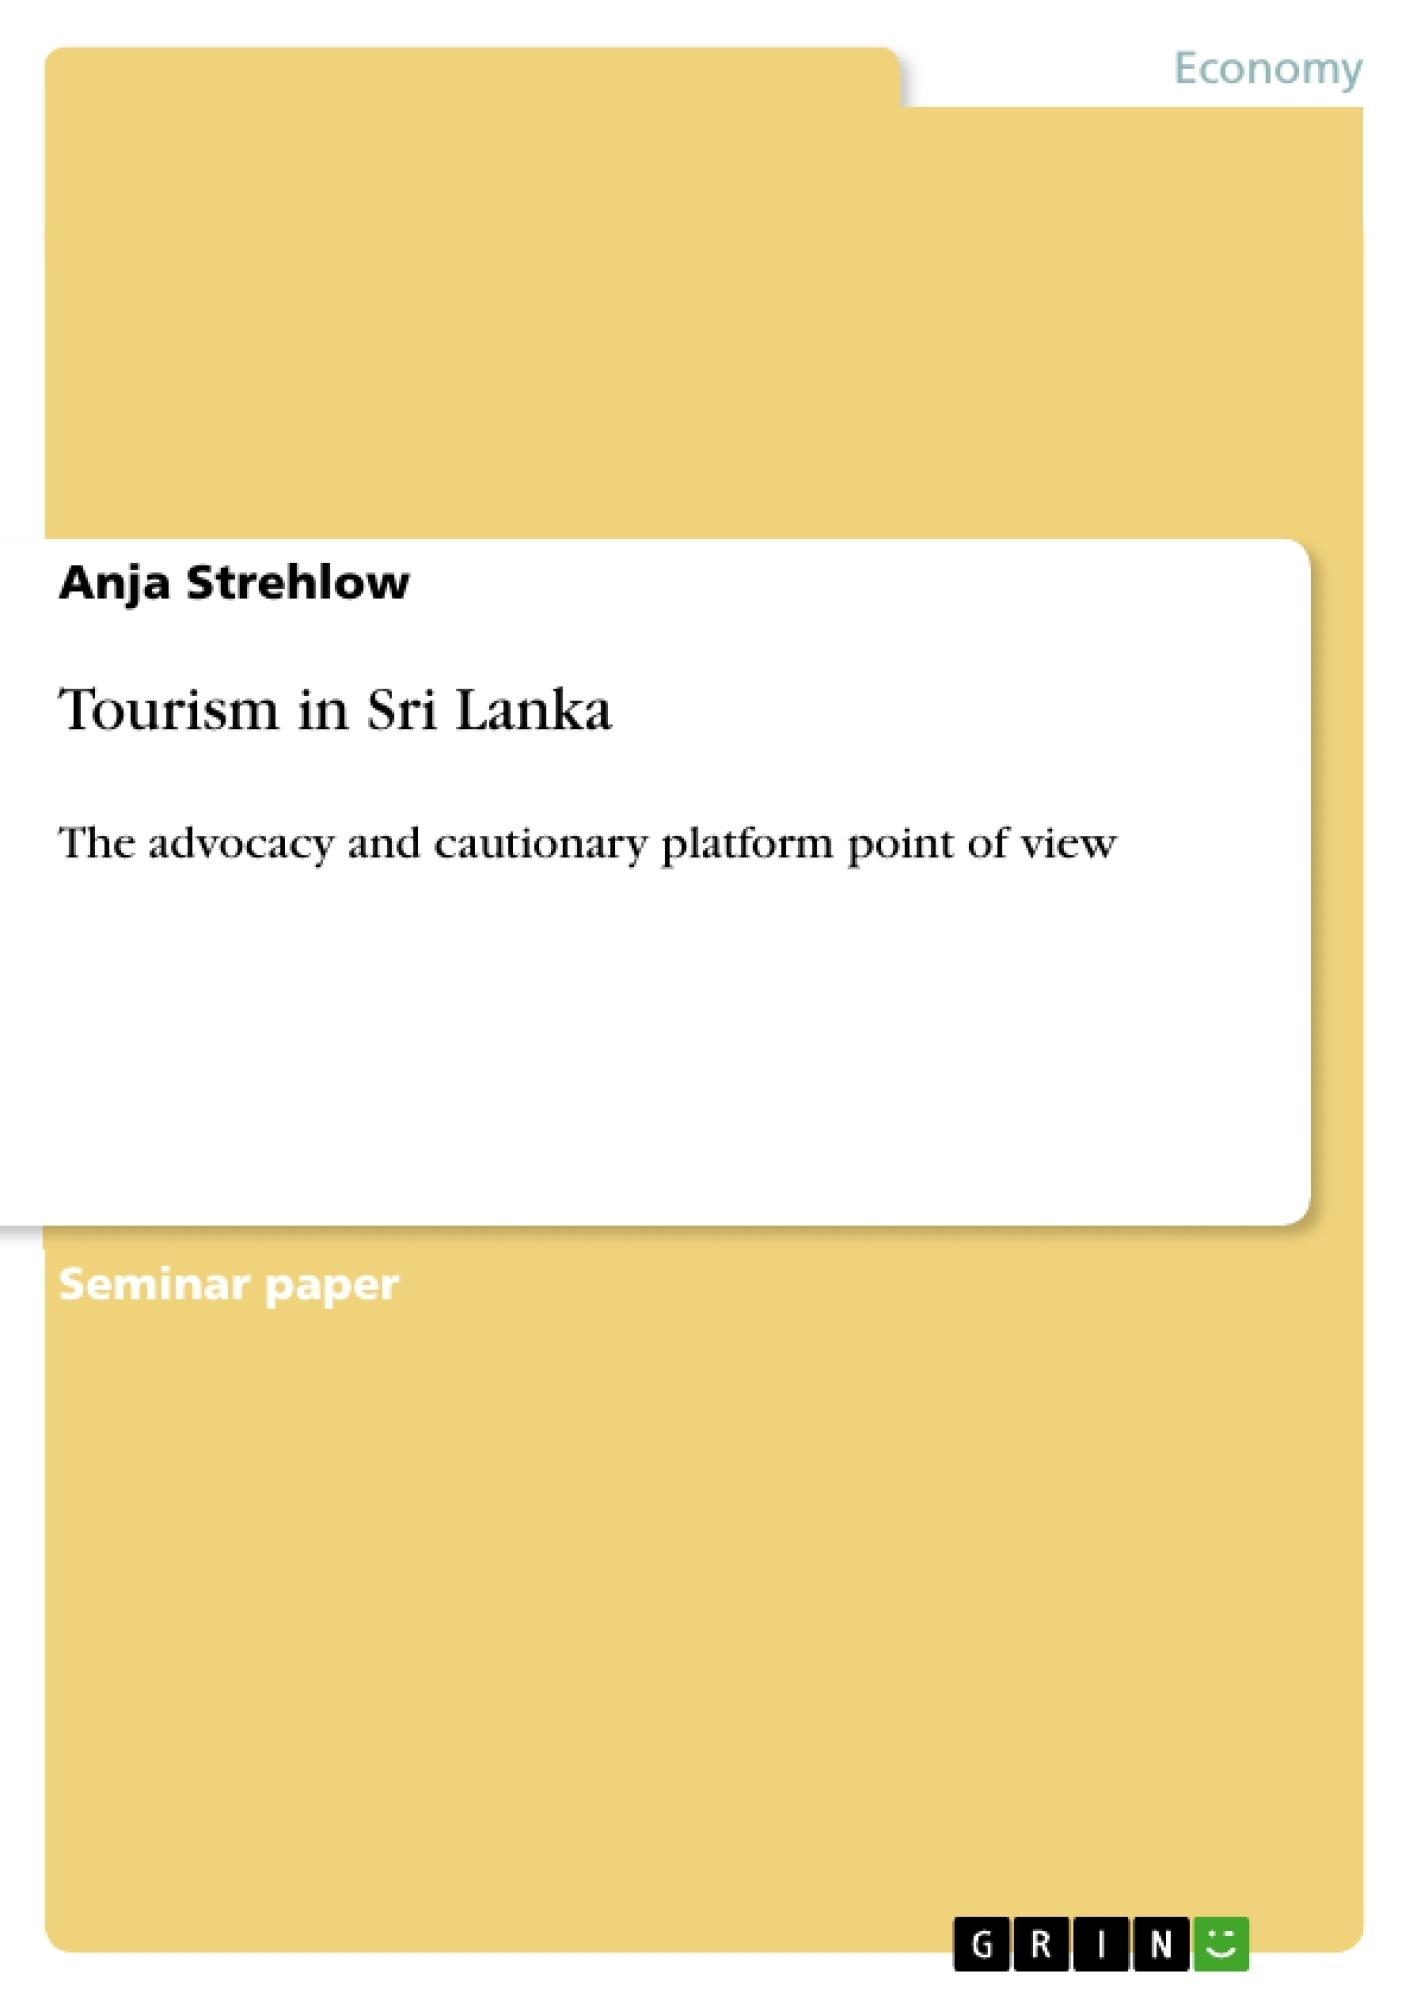 Title: Tourism in Sri Lanka